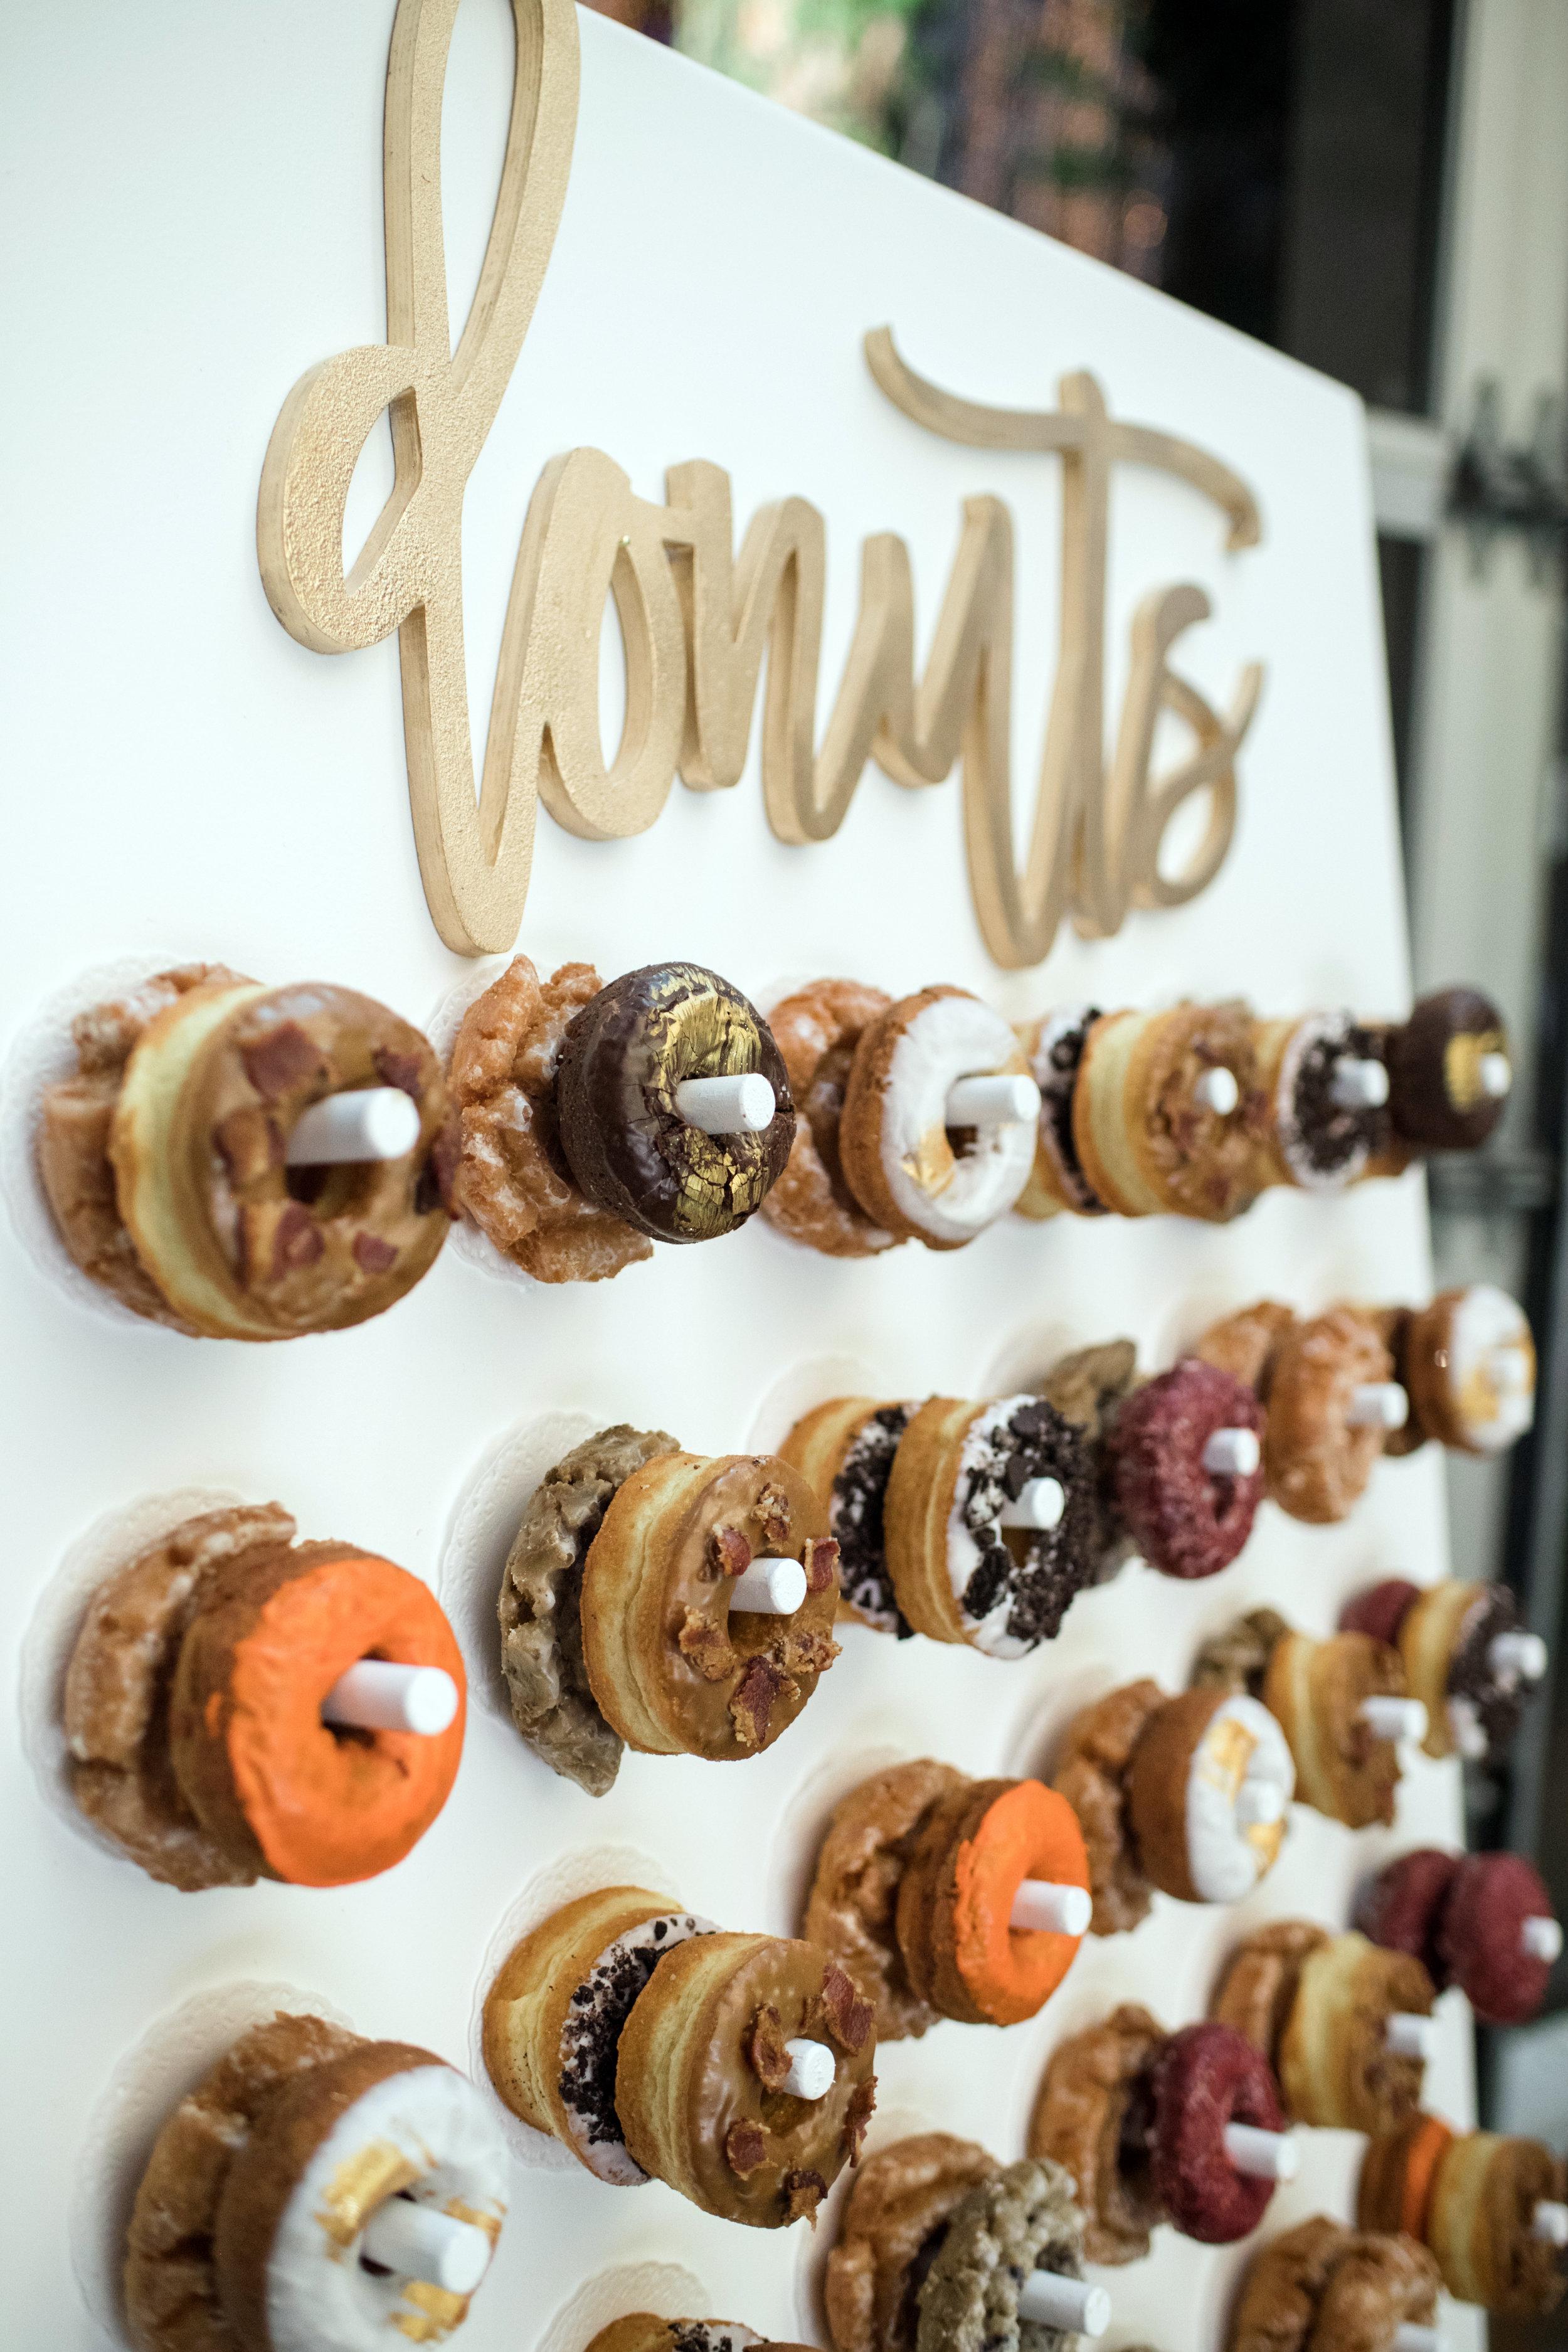 Donut Wall - Close Up